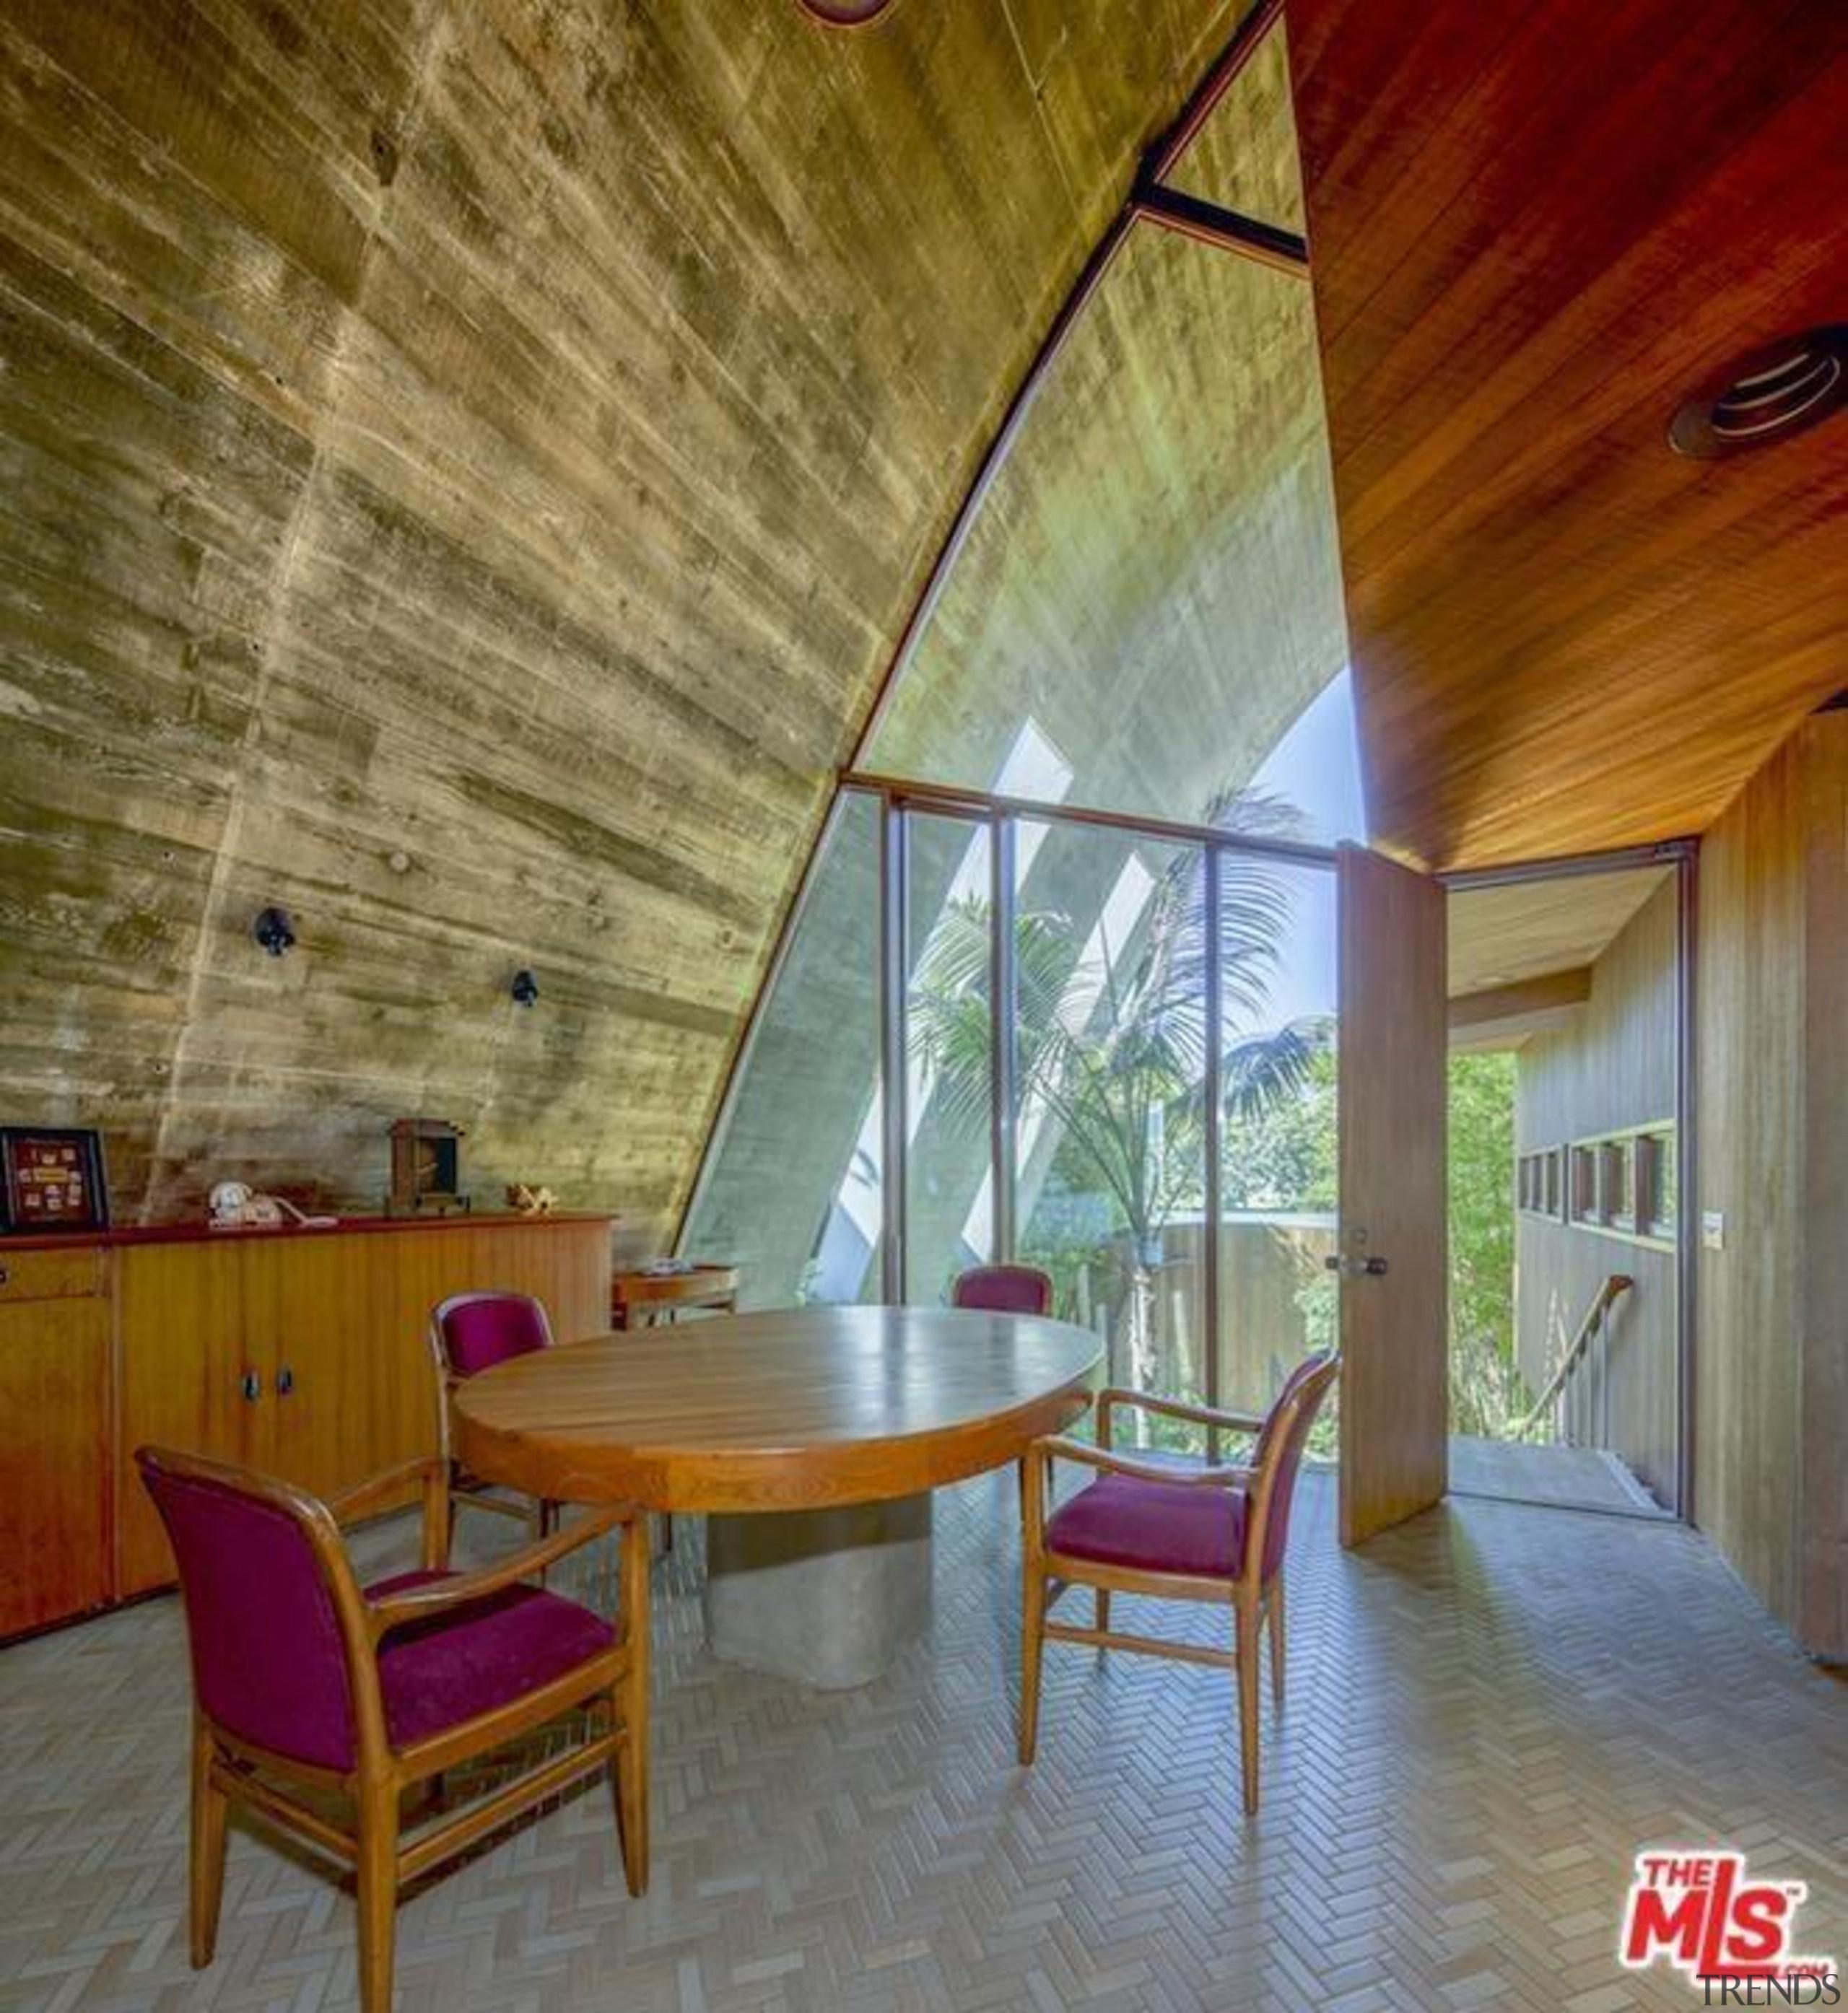 Edward Norton's new Malibu Colony home – Trulia architecture, ceiling, estate, home, house, interior design, lobby, real estate, room, wall, wood, brown, gray